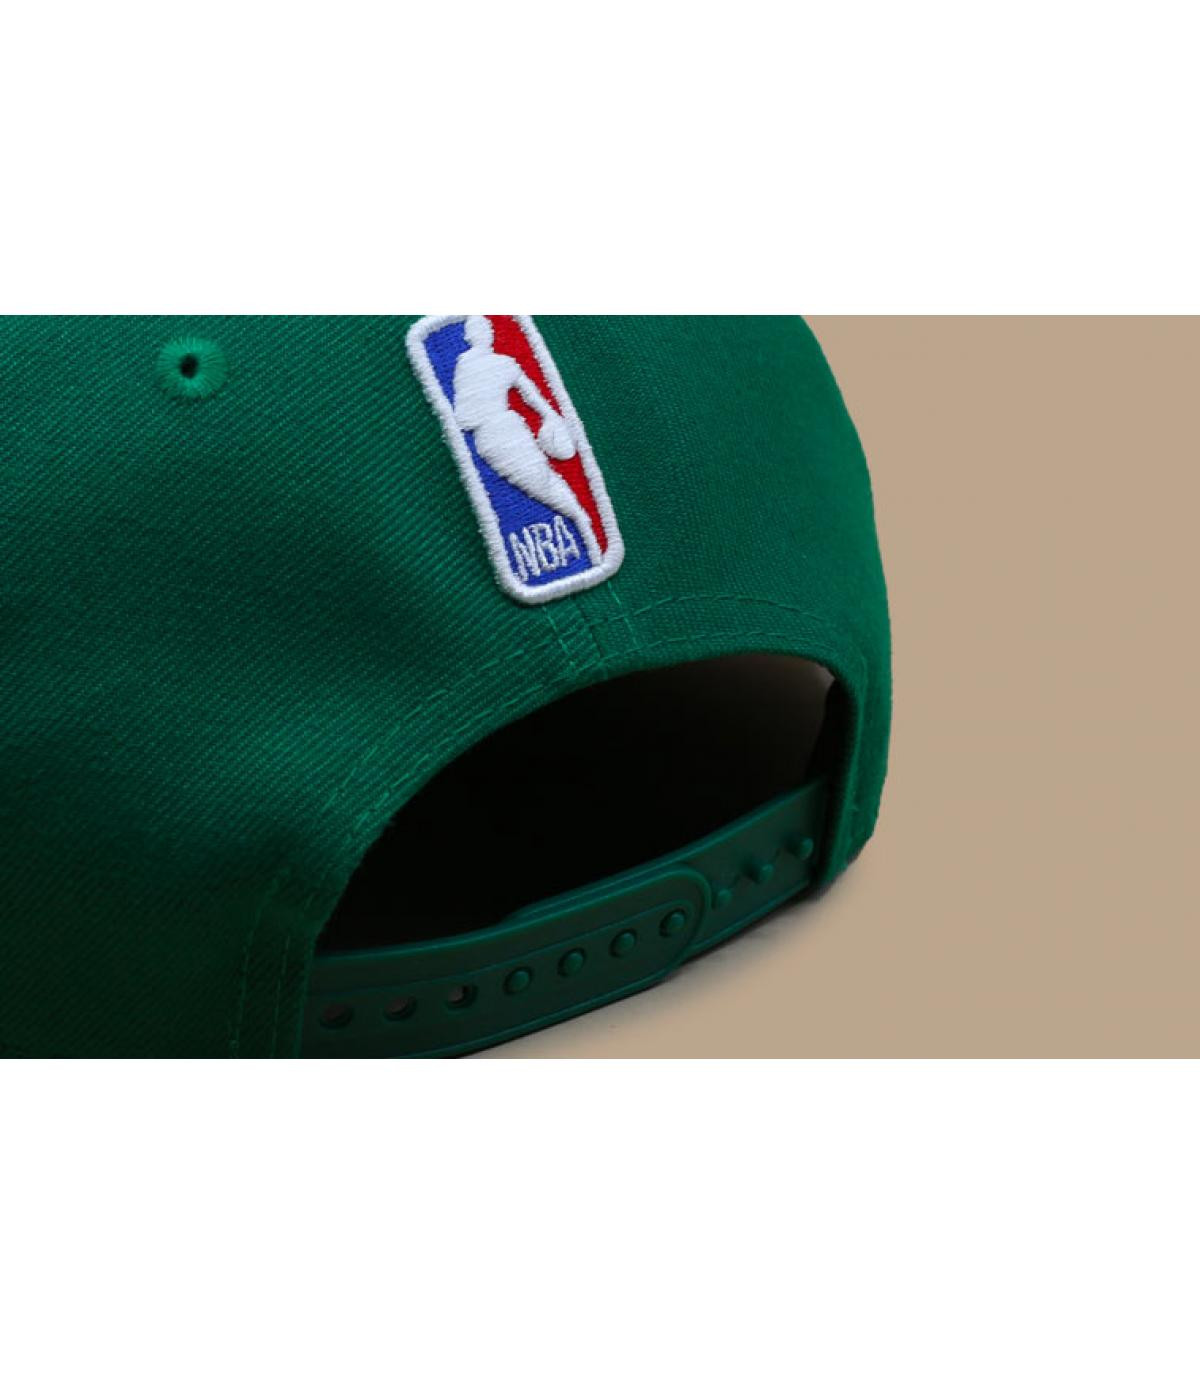 Détails Snapback NBA Draft Celtics 950 - image 5